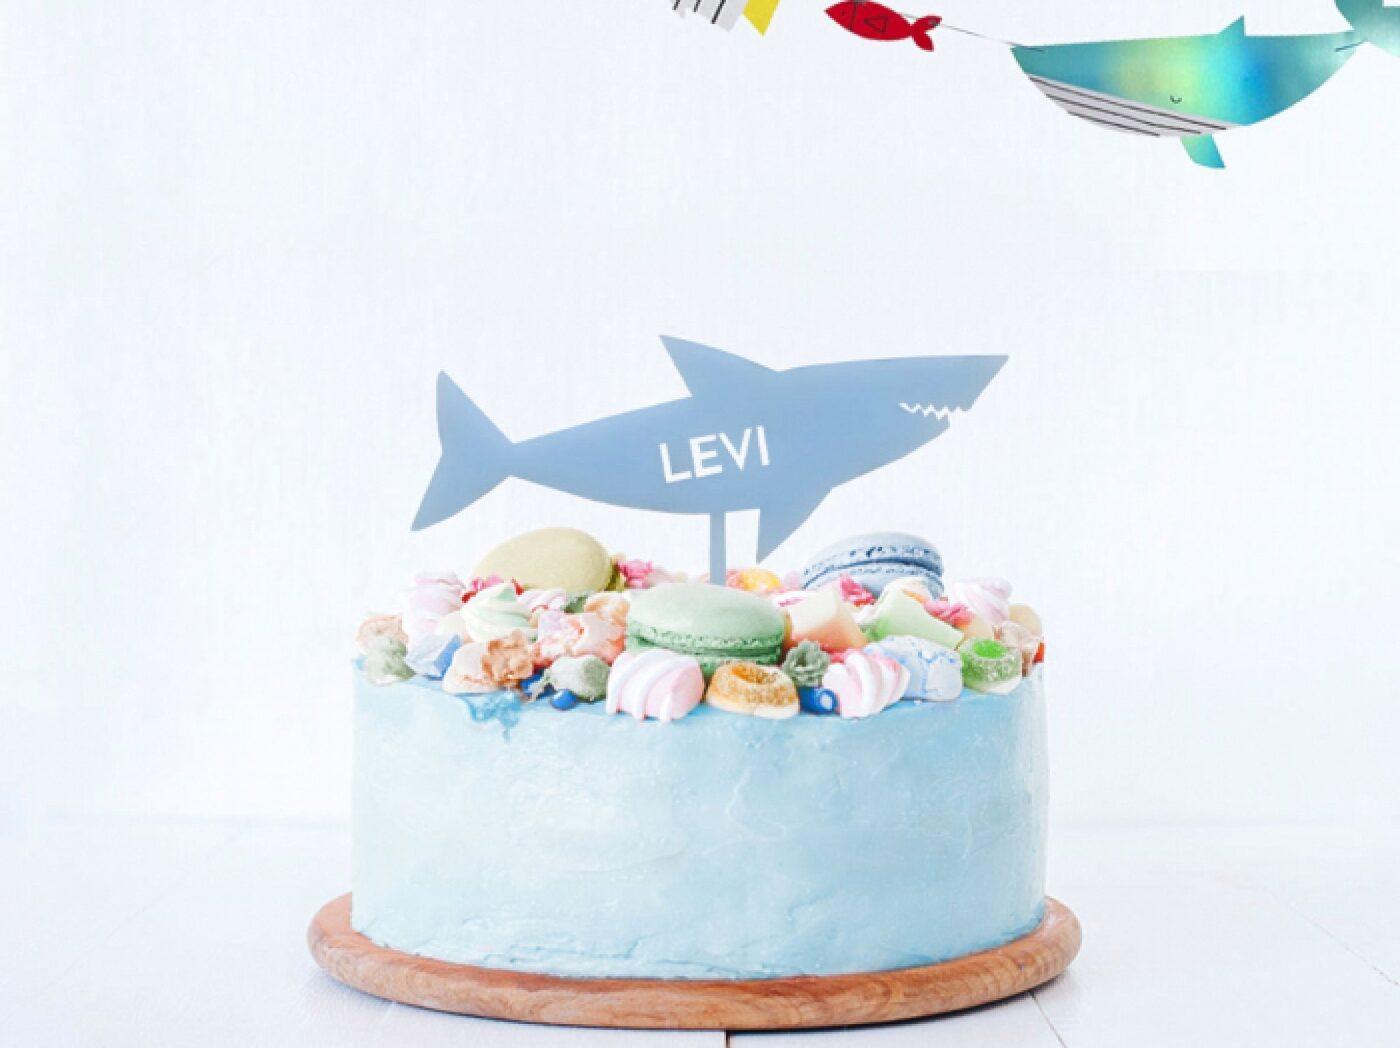 Hoe organiseer je een shark-tastic kinderfeestje?, partydeco